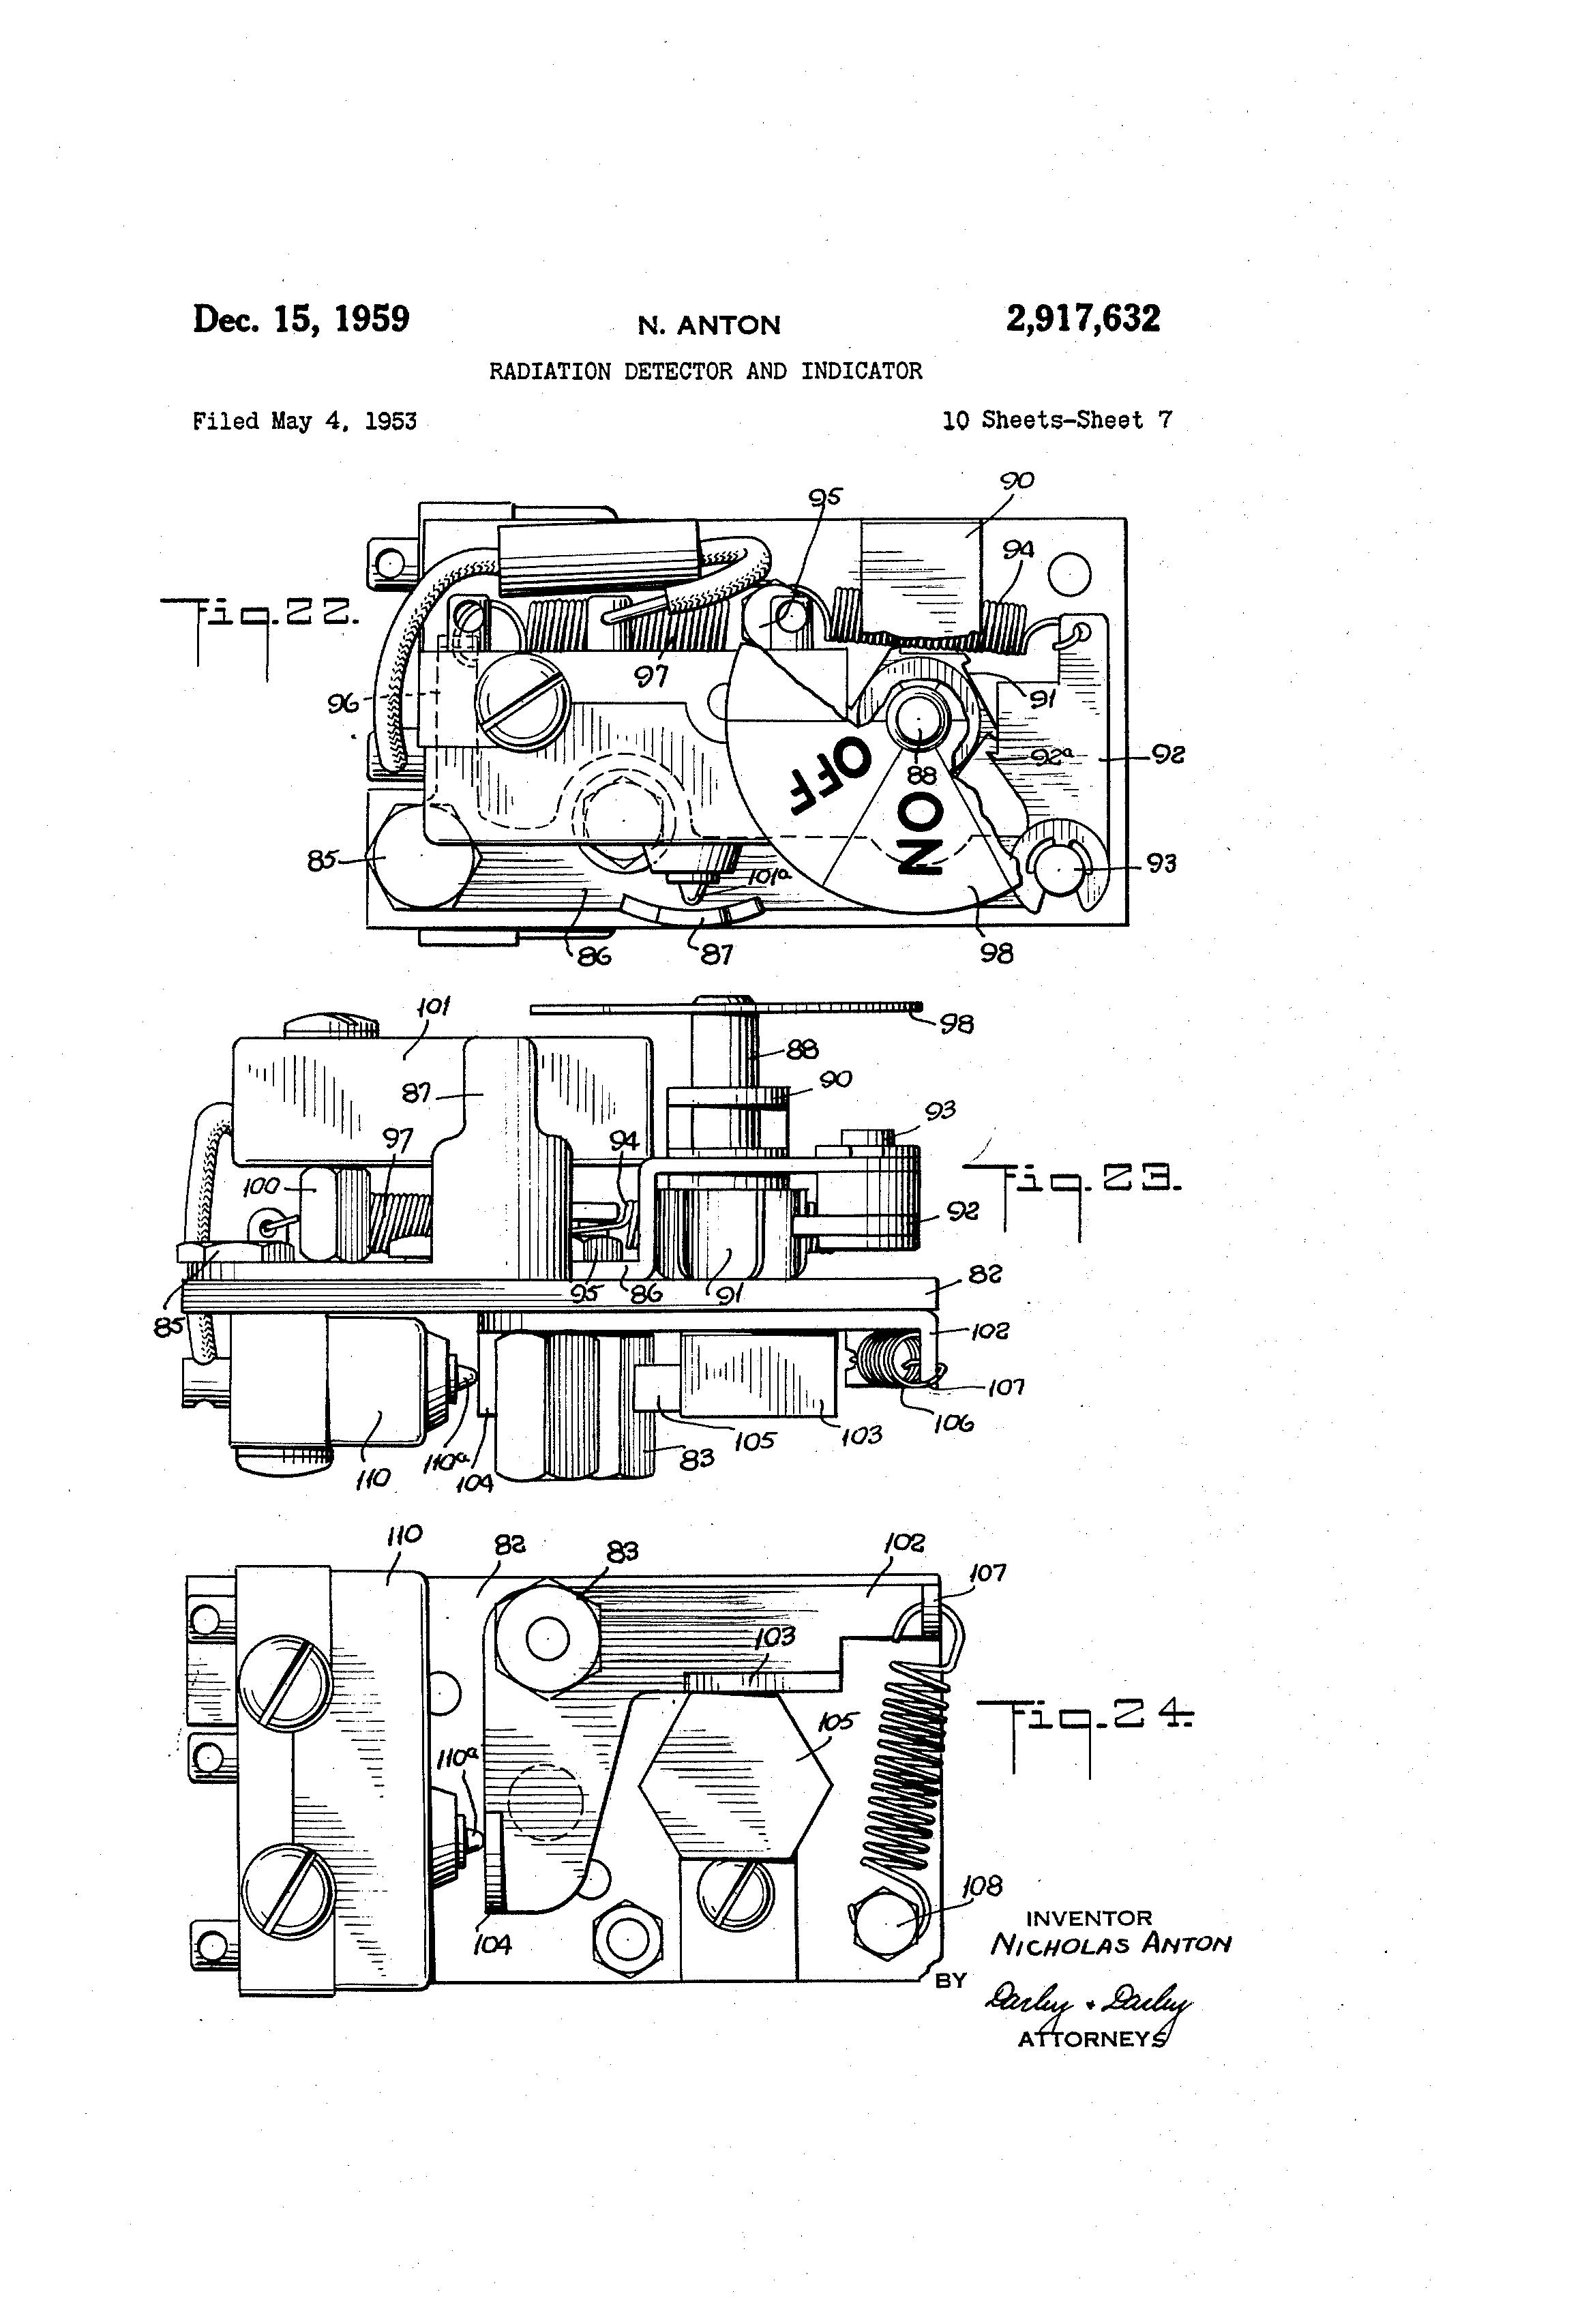 Us2917632 Radiation Detector And Indicator Mimi 24 Pin Wiring Diagram Patent Drawing